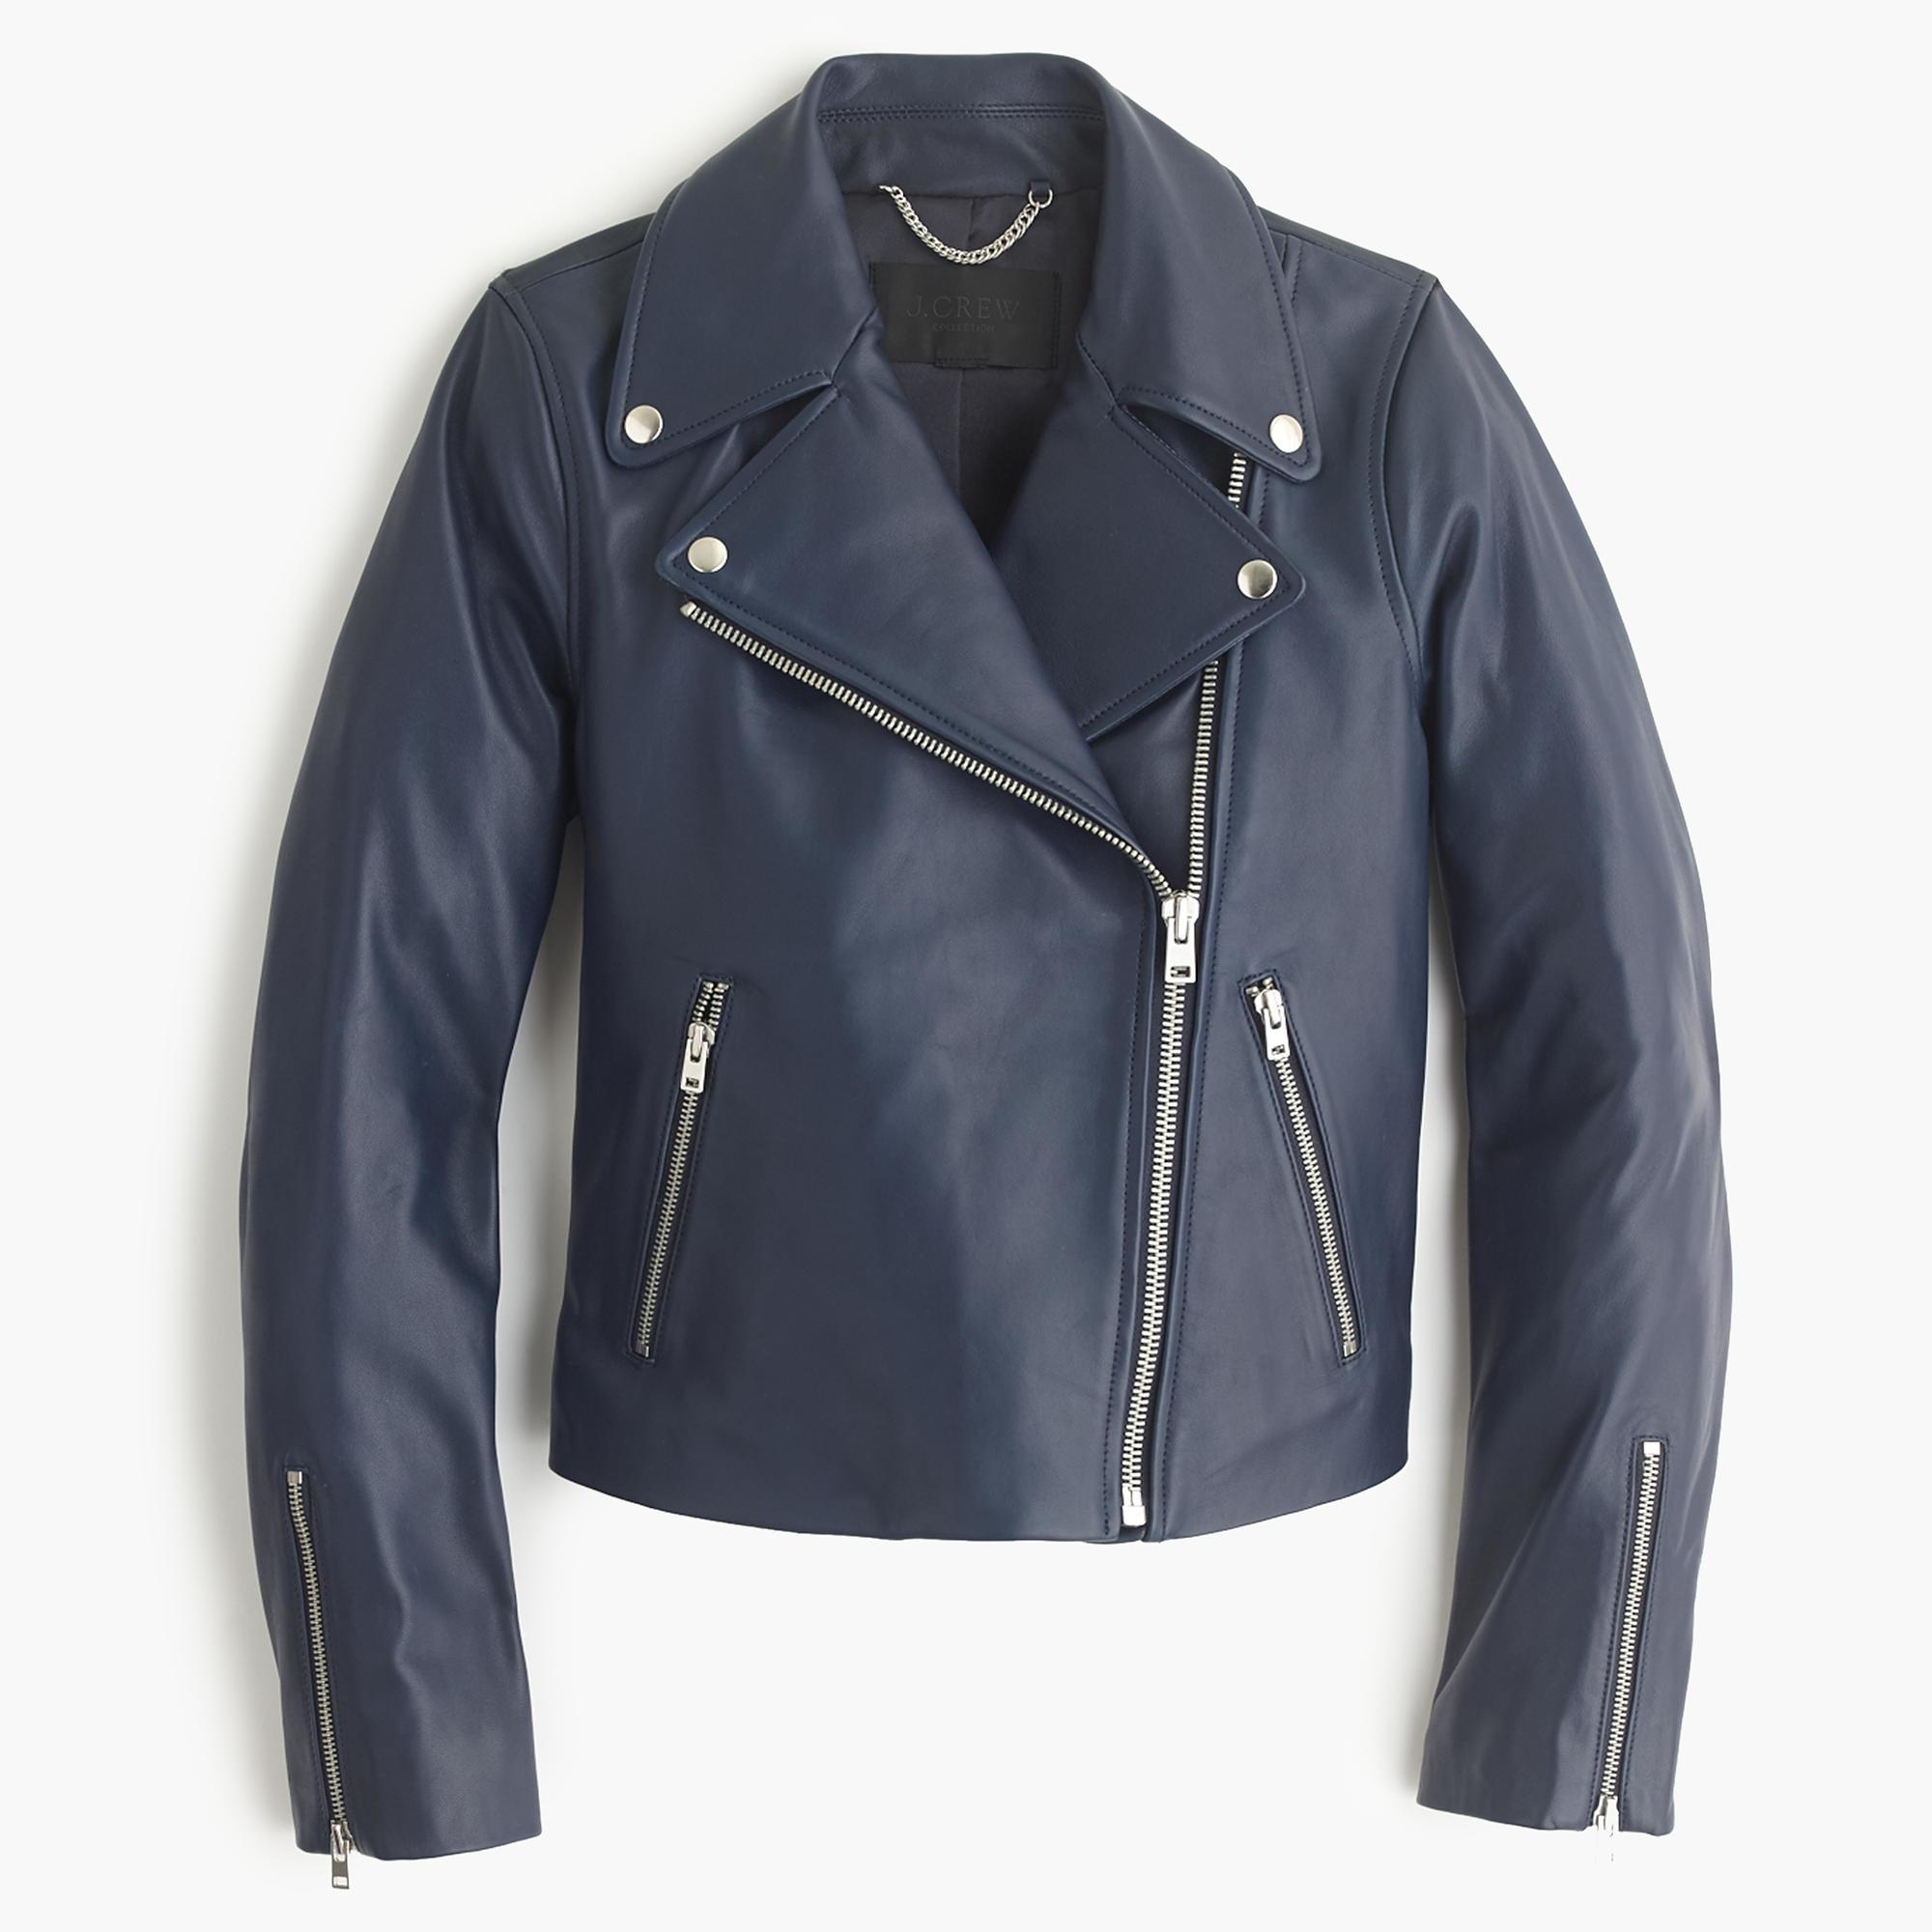 Coloured leather biker jackets